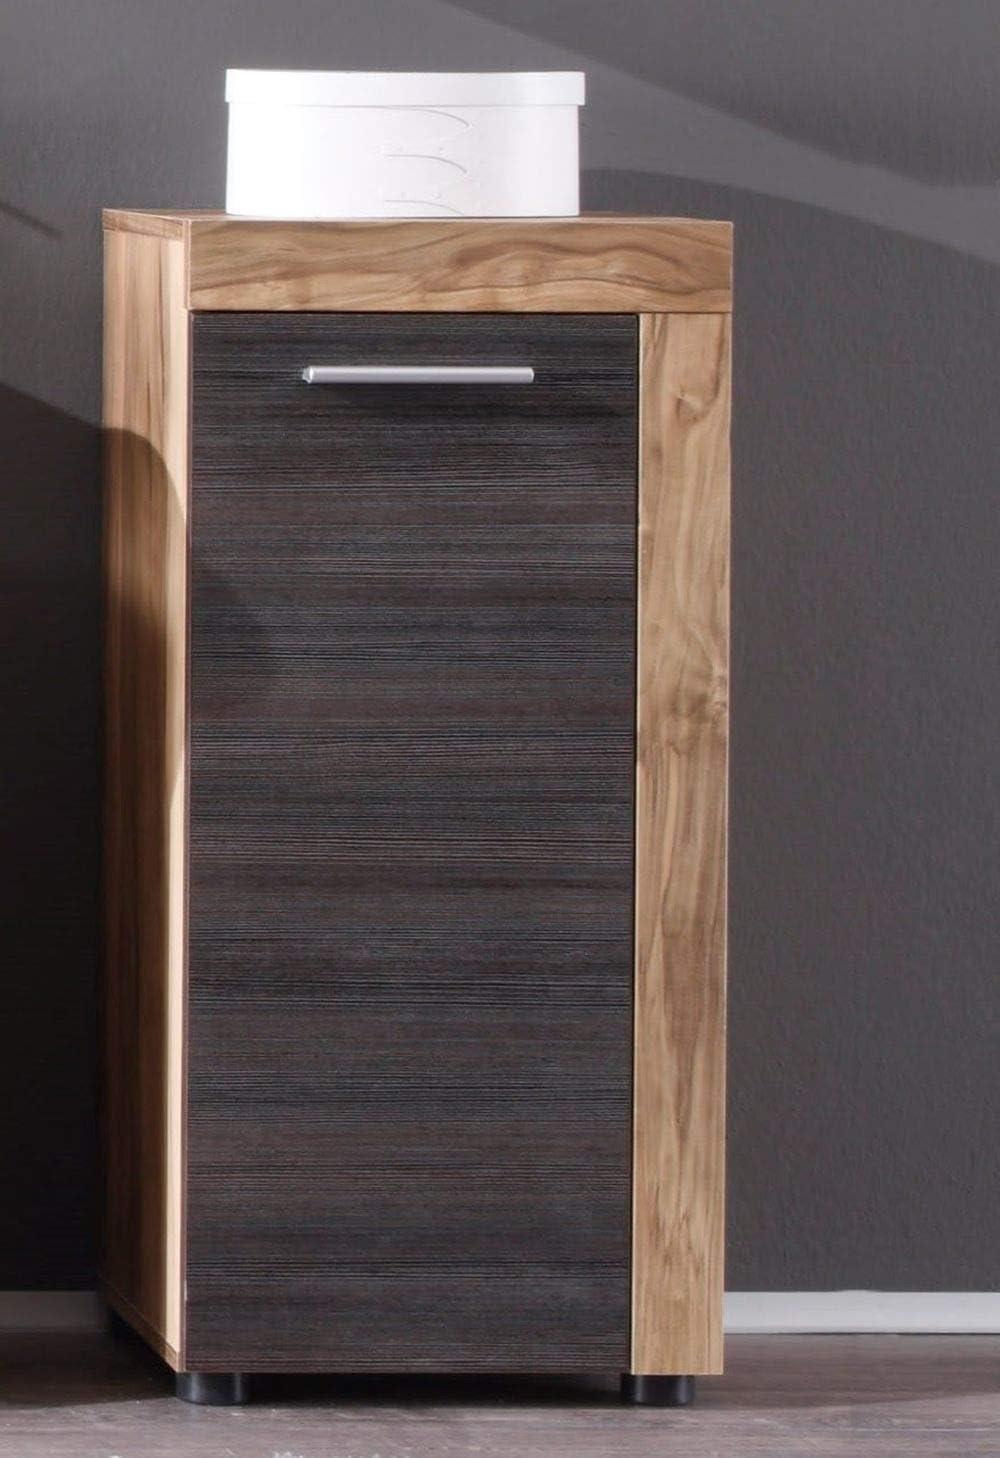 4-teilig Touchwood Dunkelbraun 123 x 184 cm Badezimmer: Badm/öbel Set Cancun Nussbaum Satin